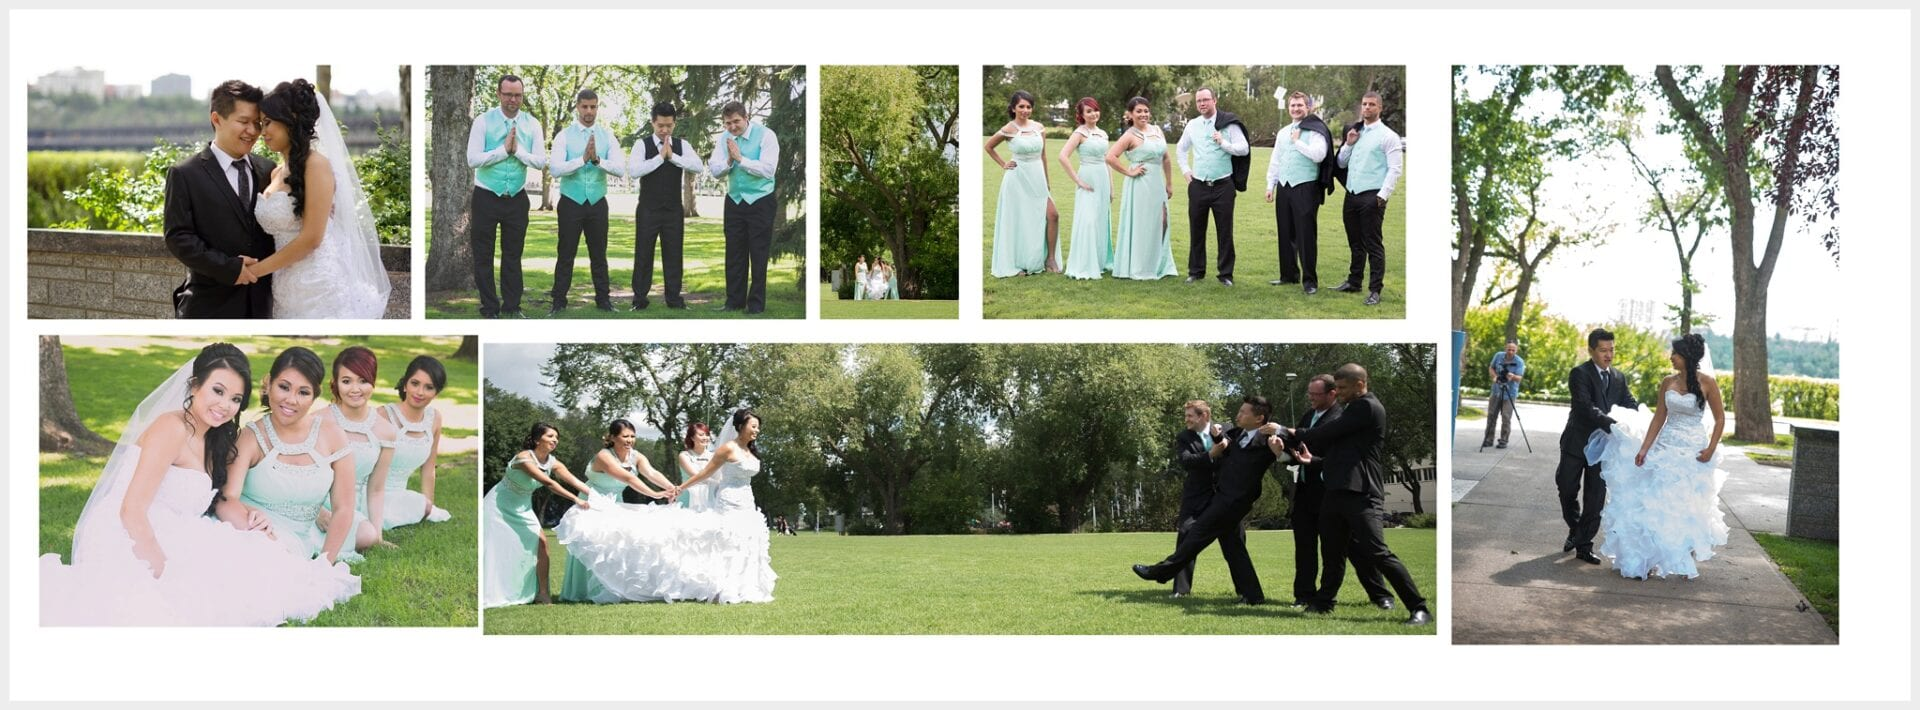 Cambodian Wedding Edmonton Calgary Photo Album-_0006